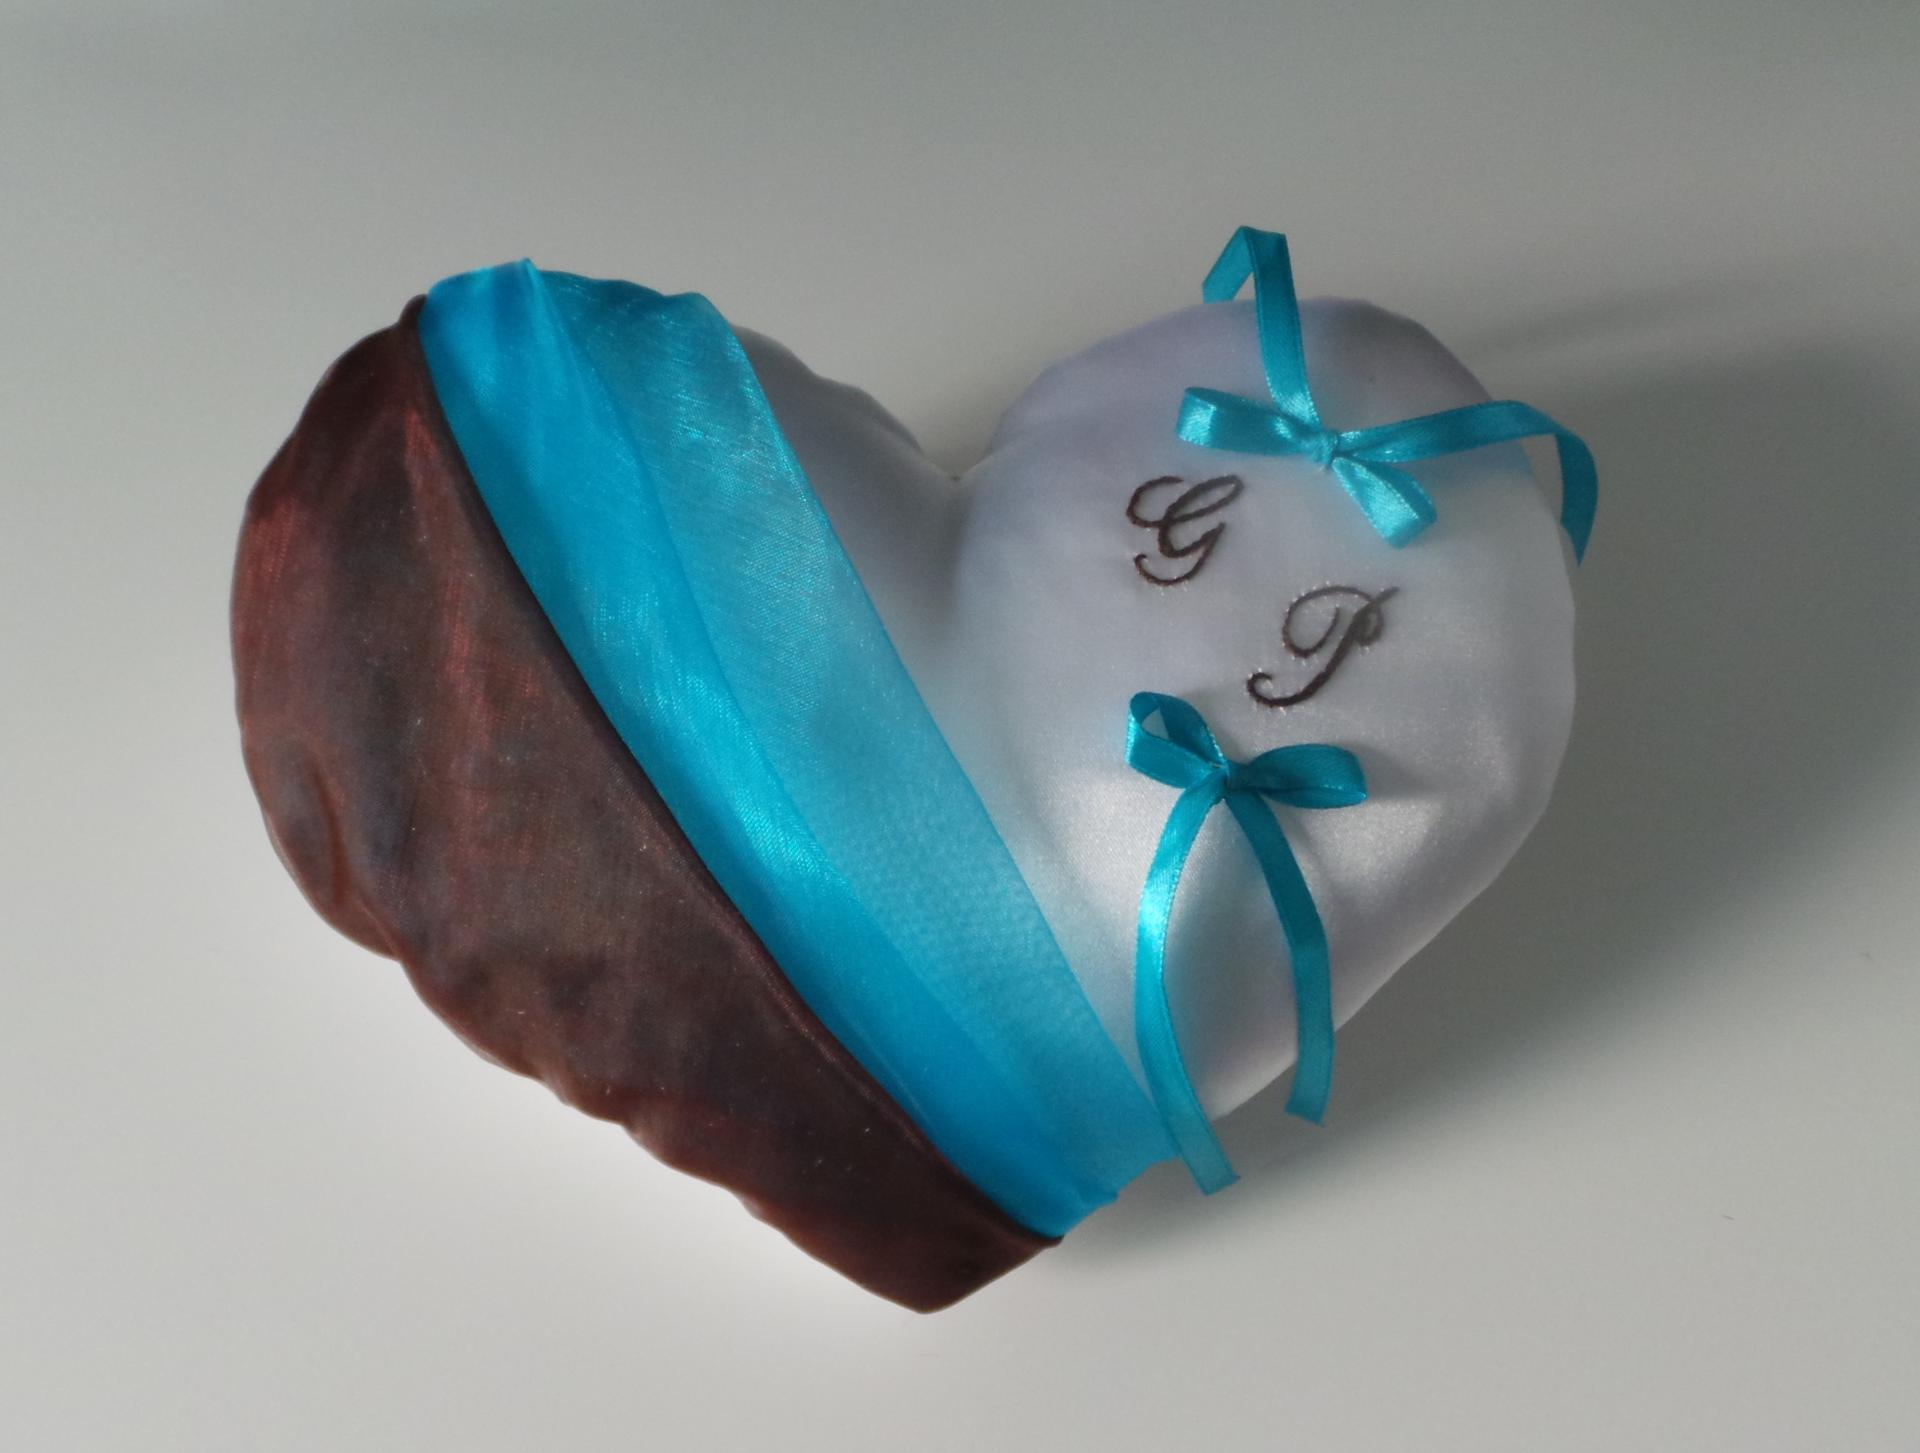 Coussin alliances coeur chocolat turquoise